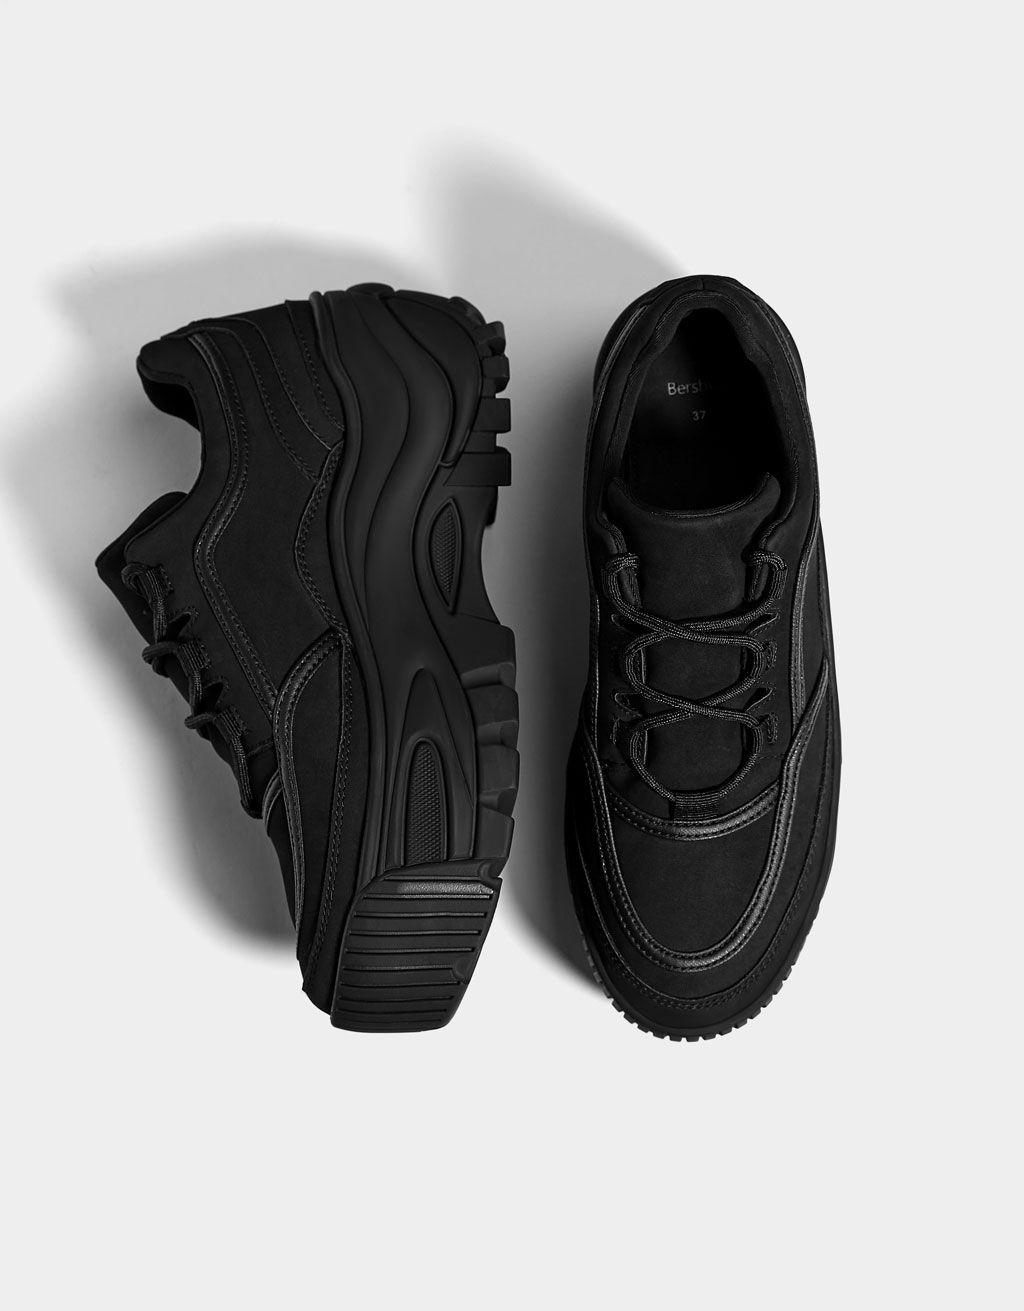 Buty Sportowe Na Platformie W Jednym Kolorze Hype Shoes Sneakers Fashion Trendy Sneakers